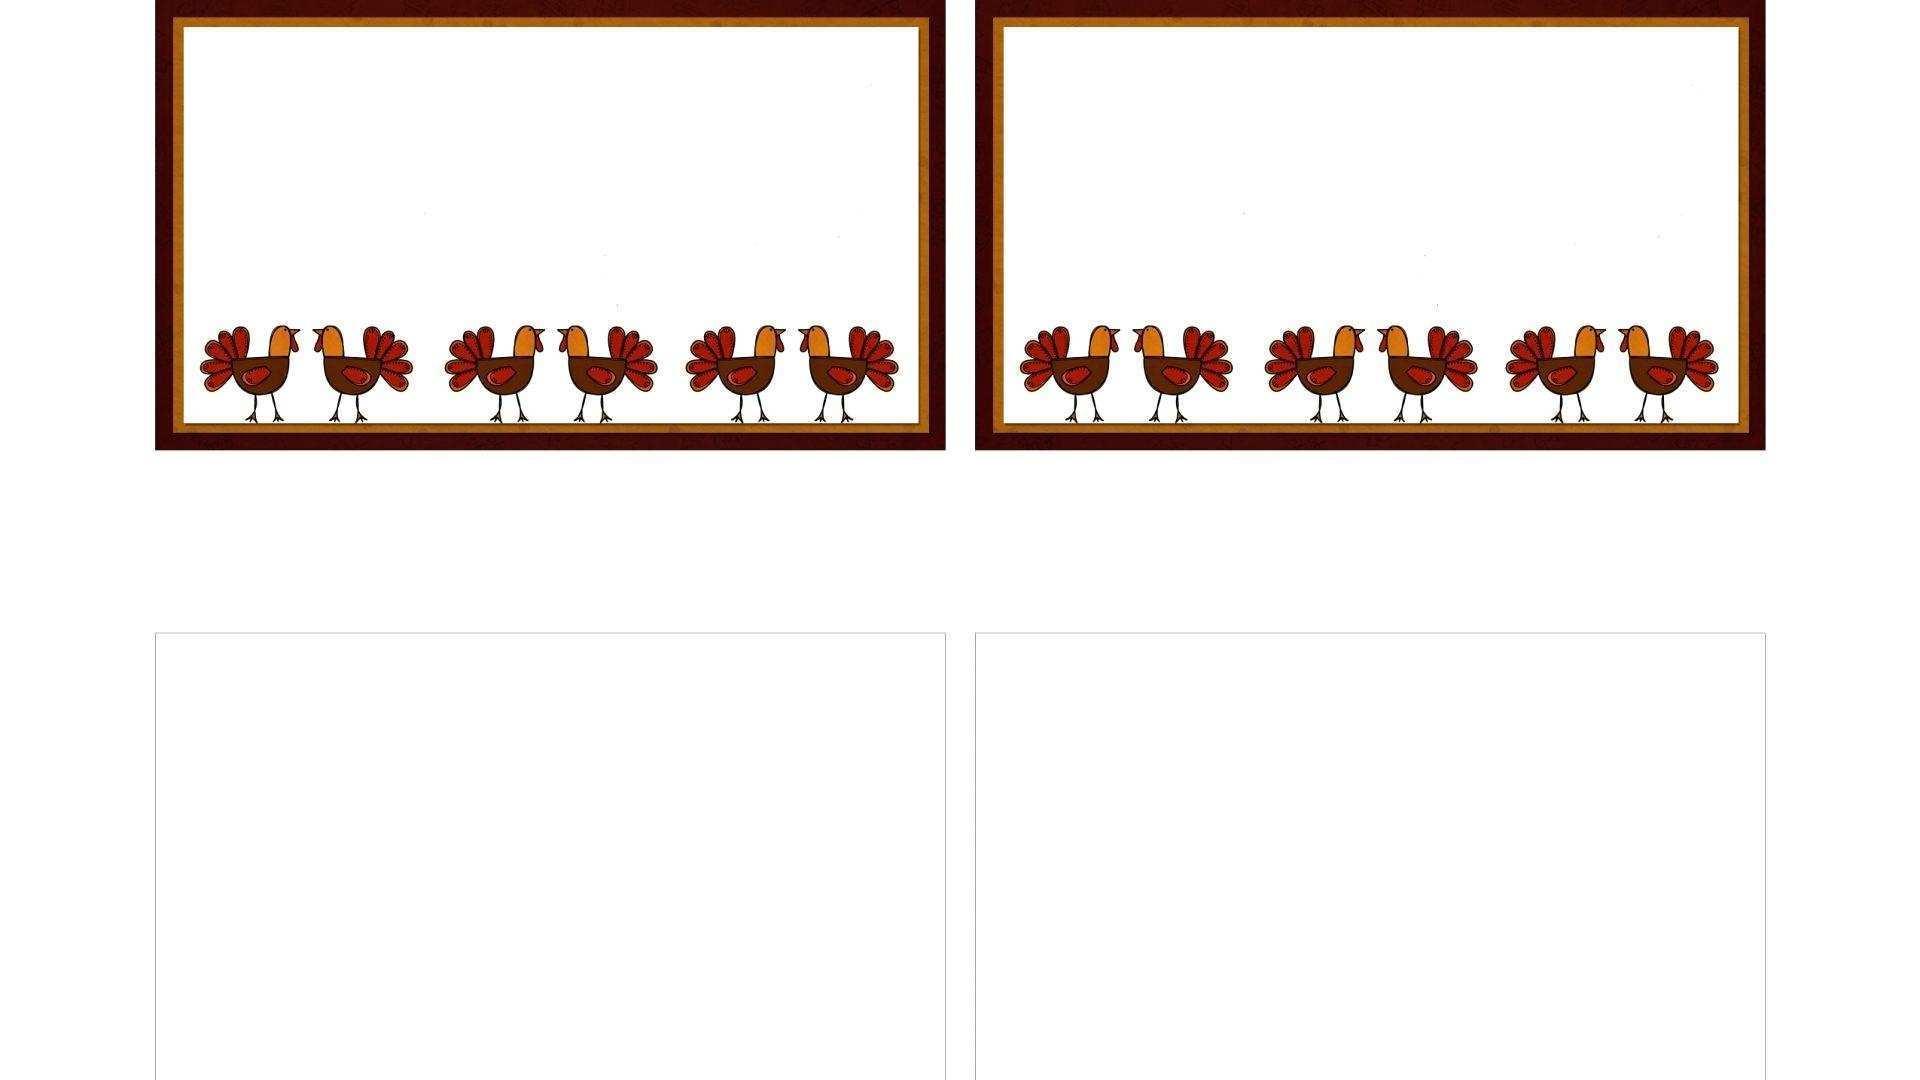 61 Creating Patrick Bateman Business Card Template Word in Word for Patrick Bateman Business Card Template Word